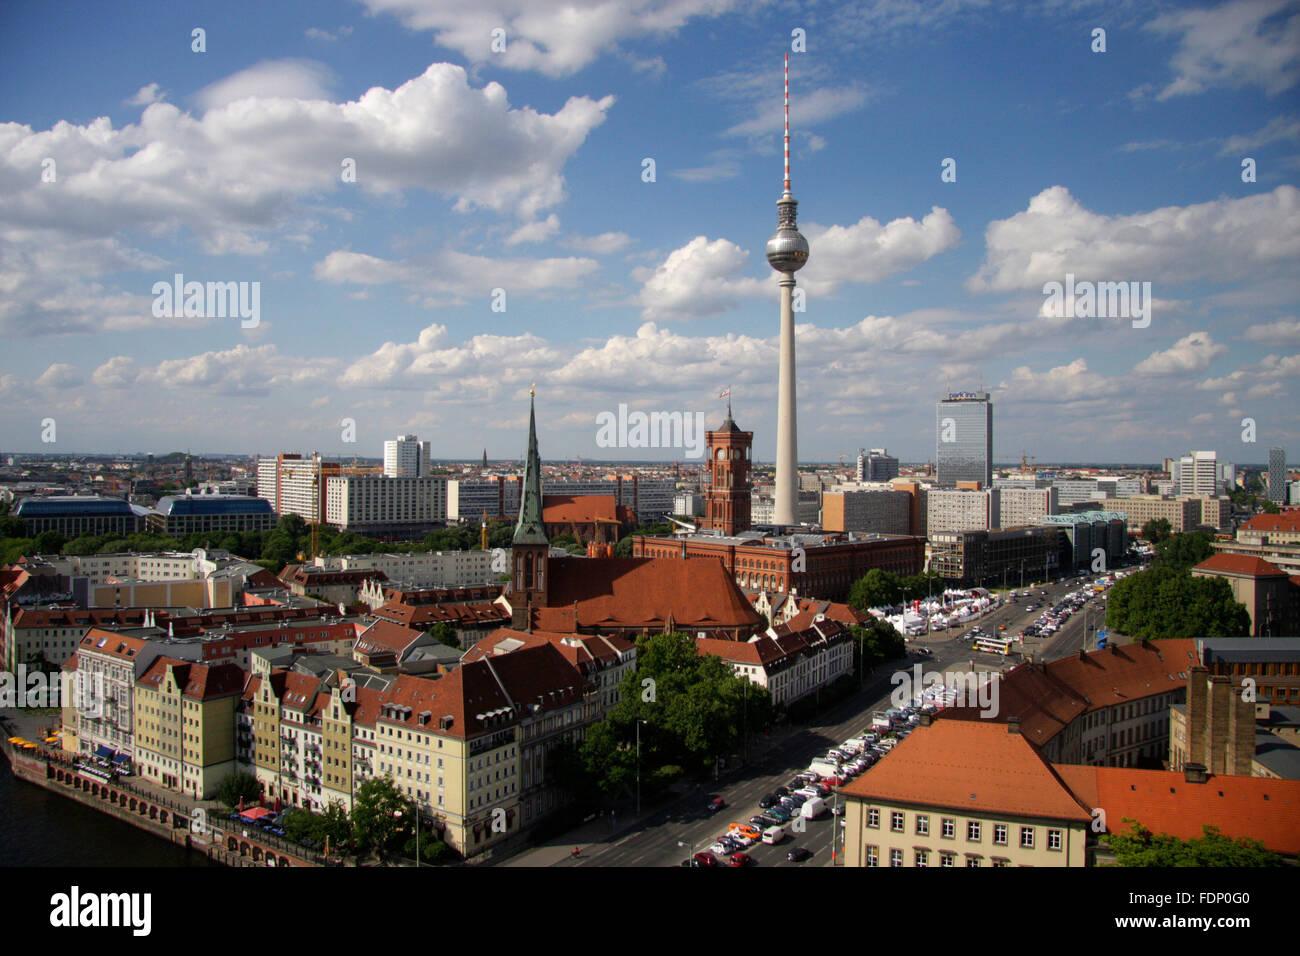 Forum Hotel Berlin